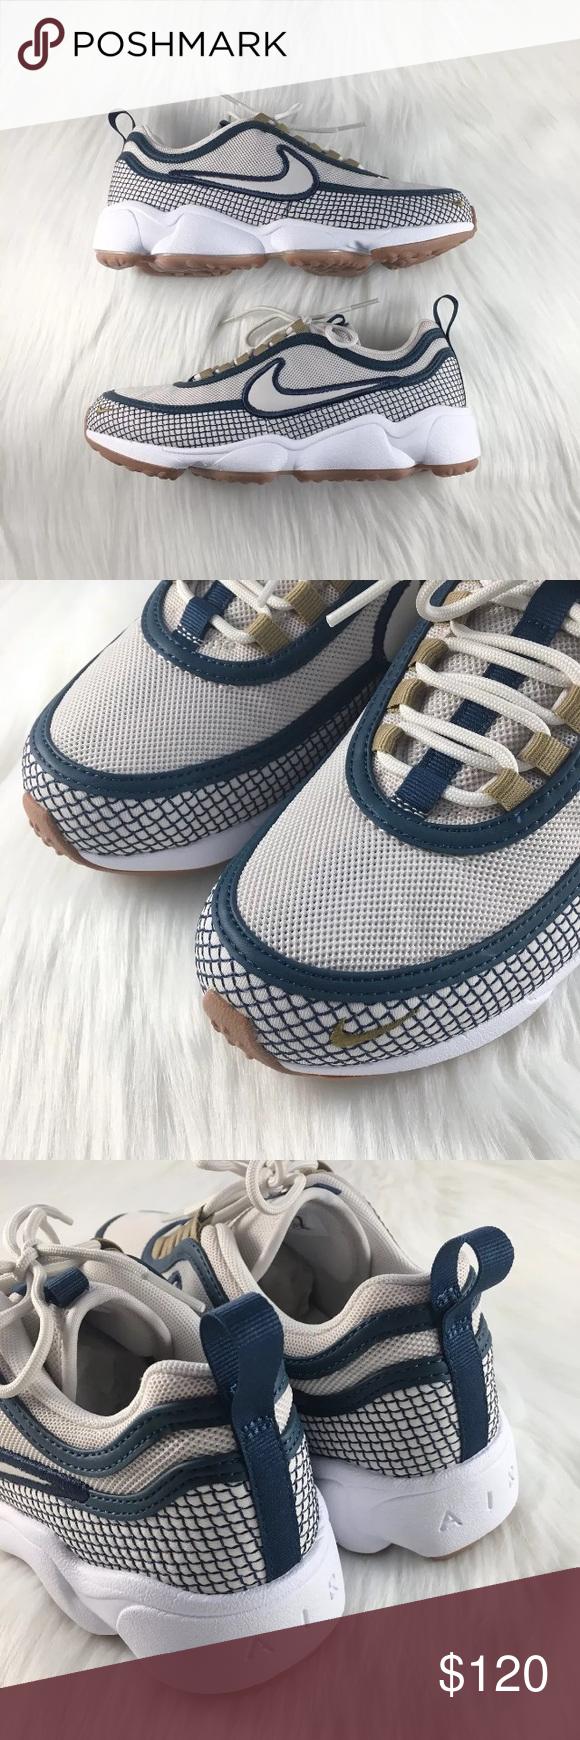 Women's Nike Zoom Spiridon Ultra Sneakers. Women's Nike